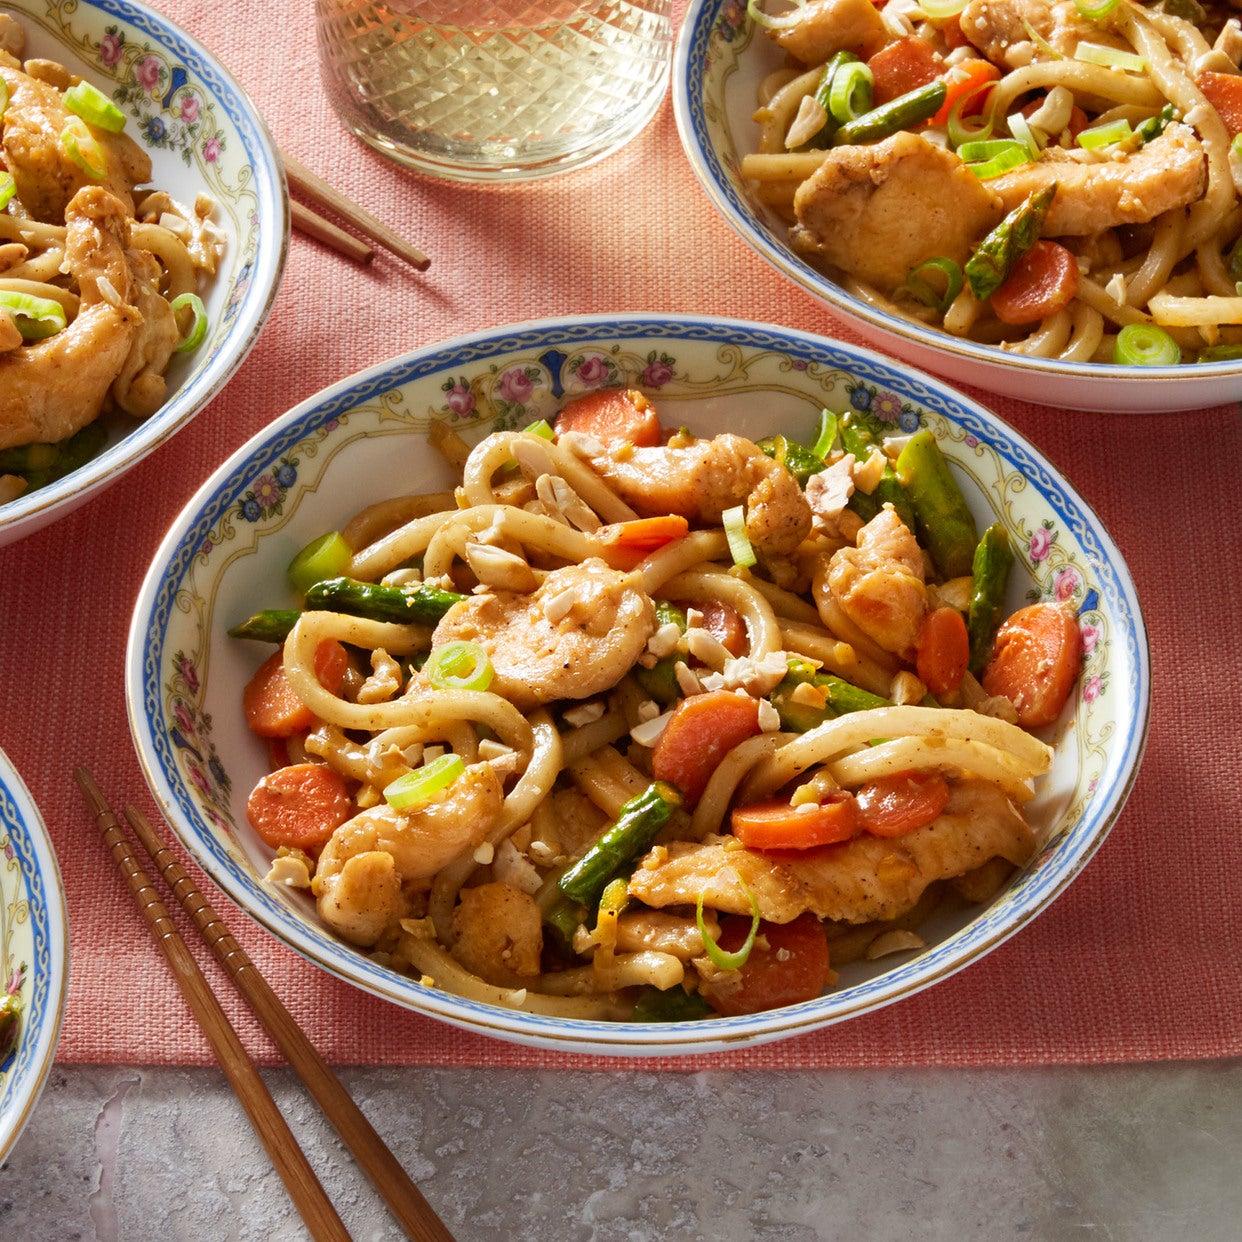 Recipes Chicken Udon Noodles: Recipe: Stir-Fried Chicken & Udon Noodles With Asparagus